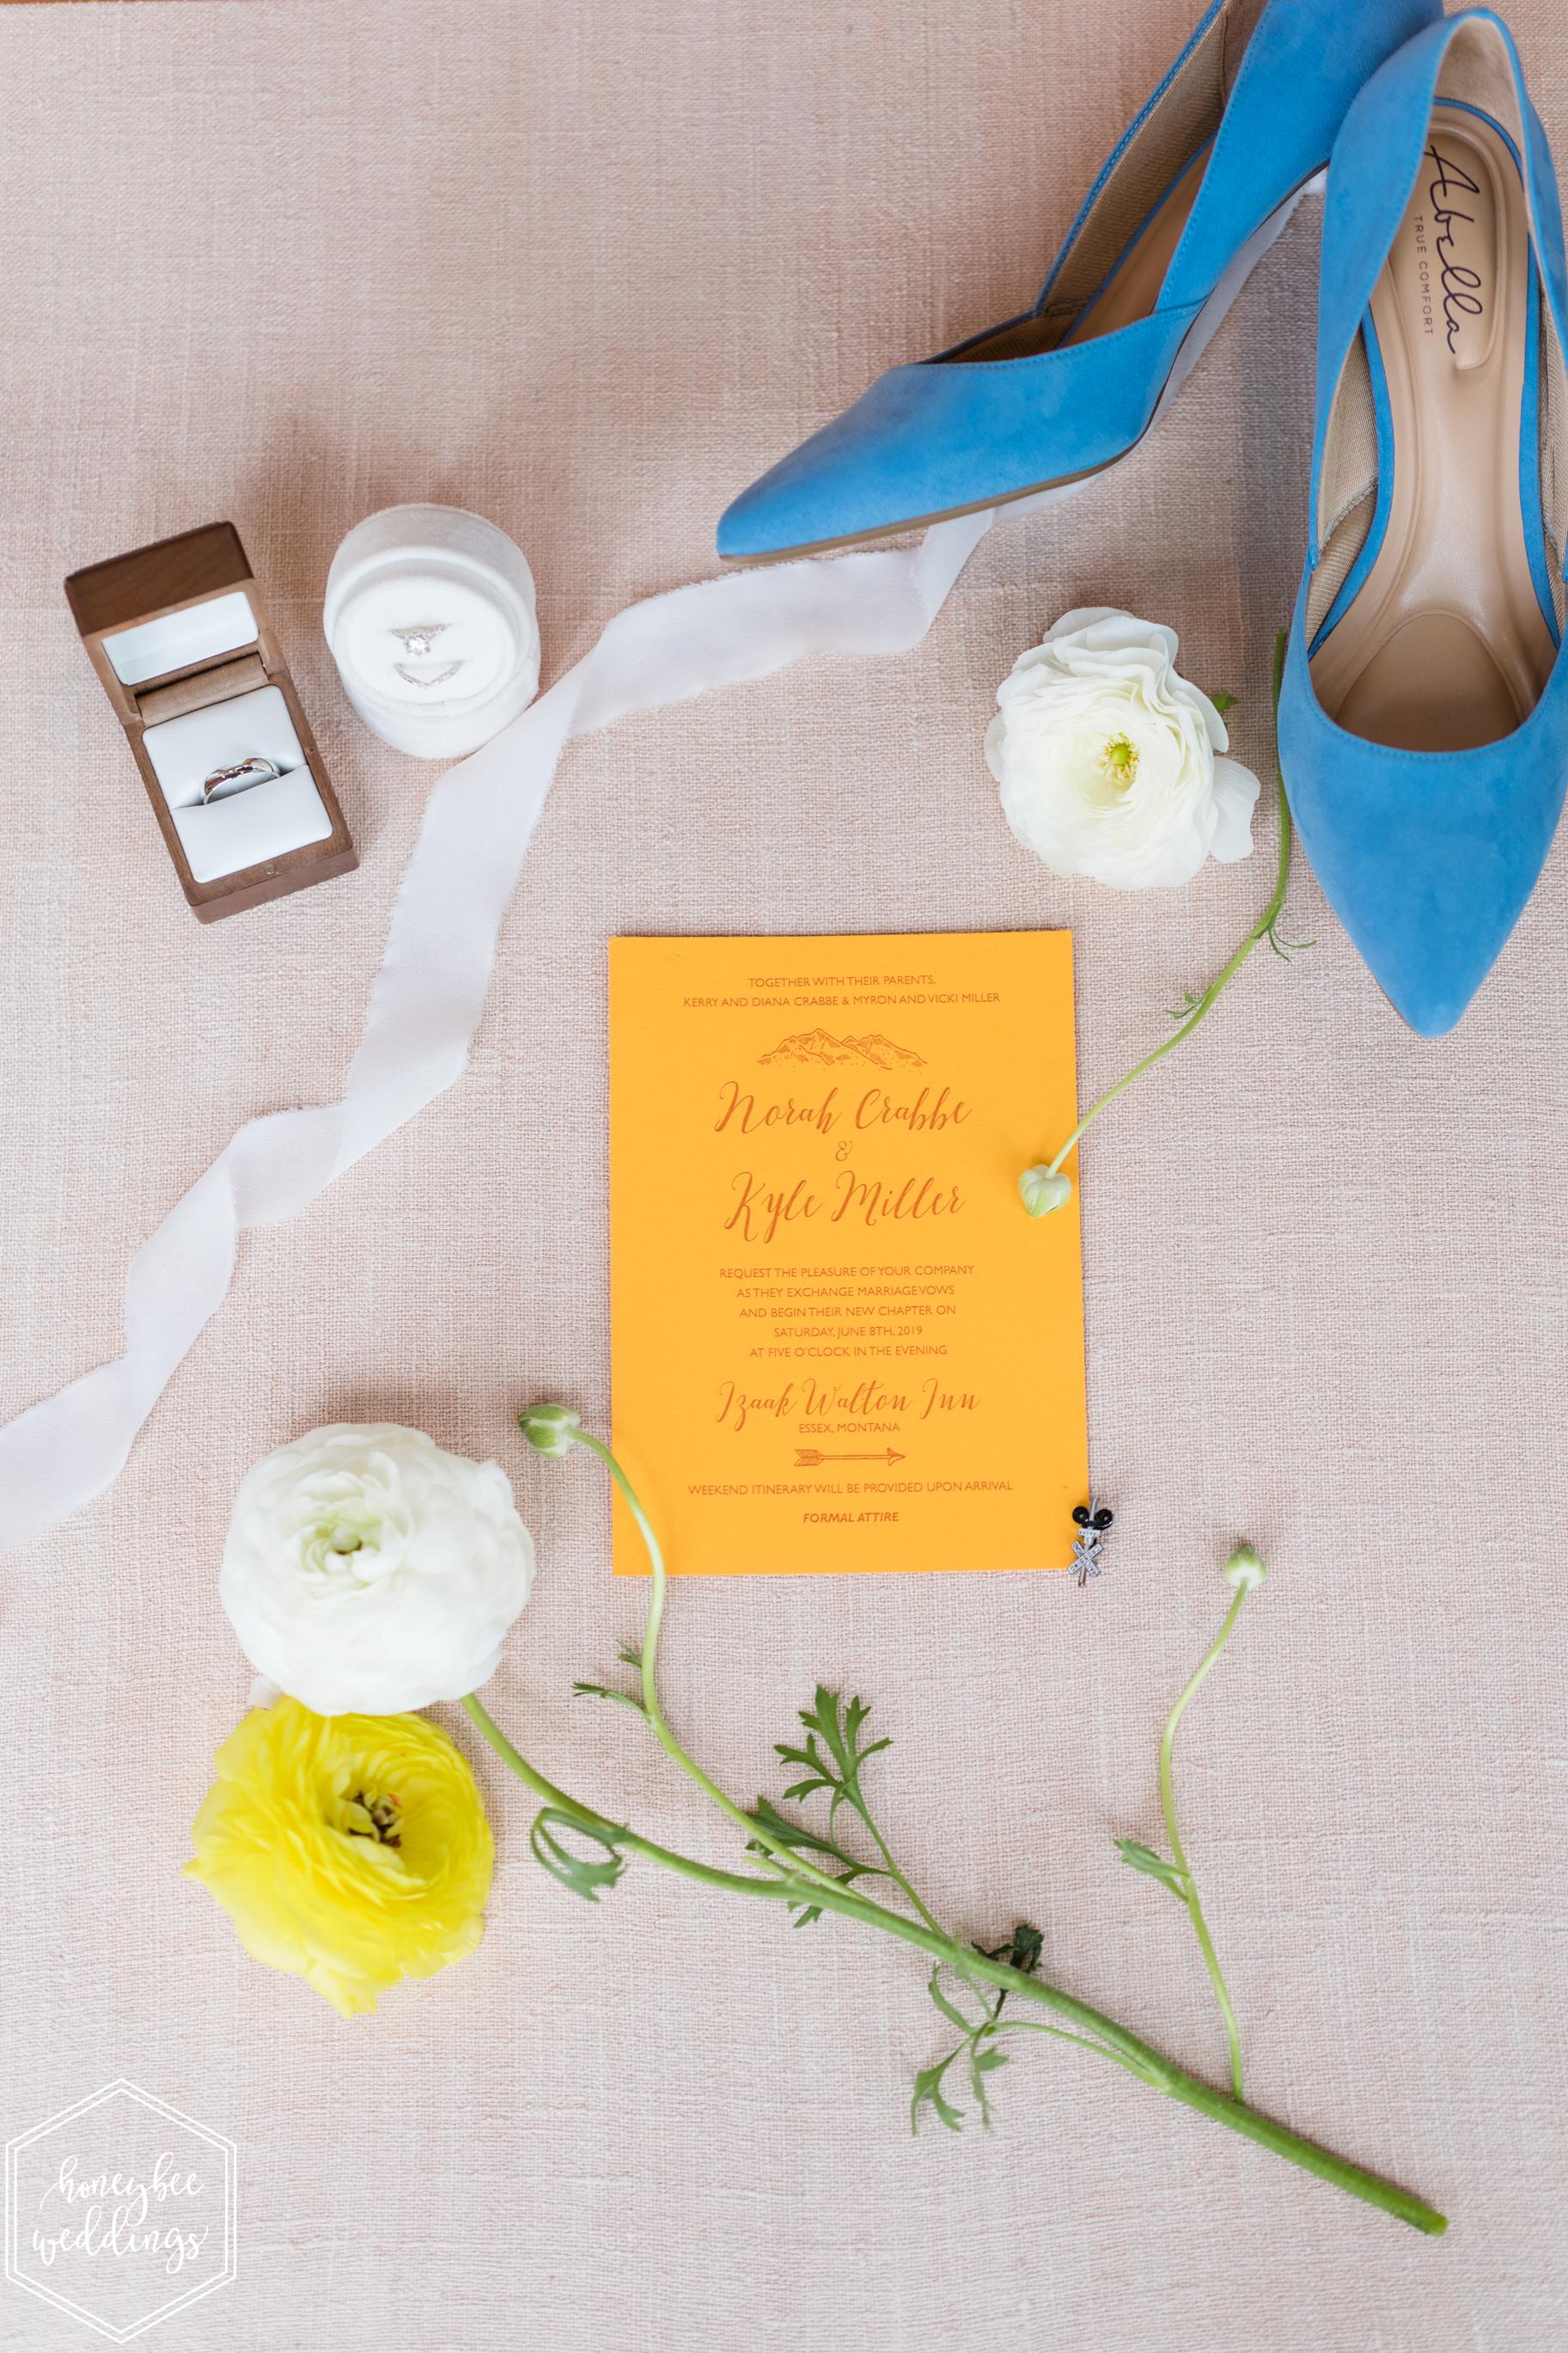 001Glacier National Park Wedding_Izaak Walton Inn Wedding_Honeybee Weddings_Norah & Kyle_June 08, 2019-7.jpg